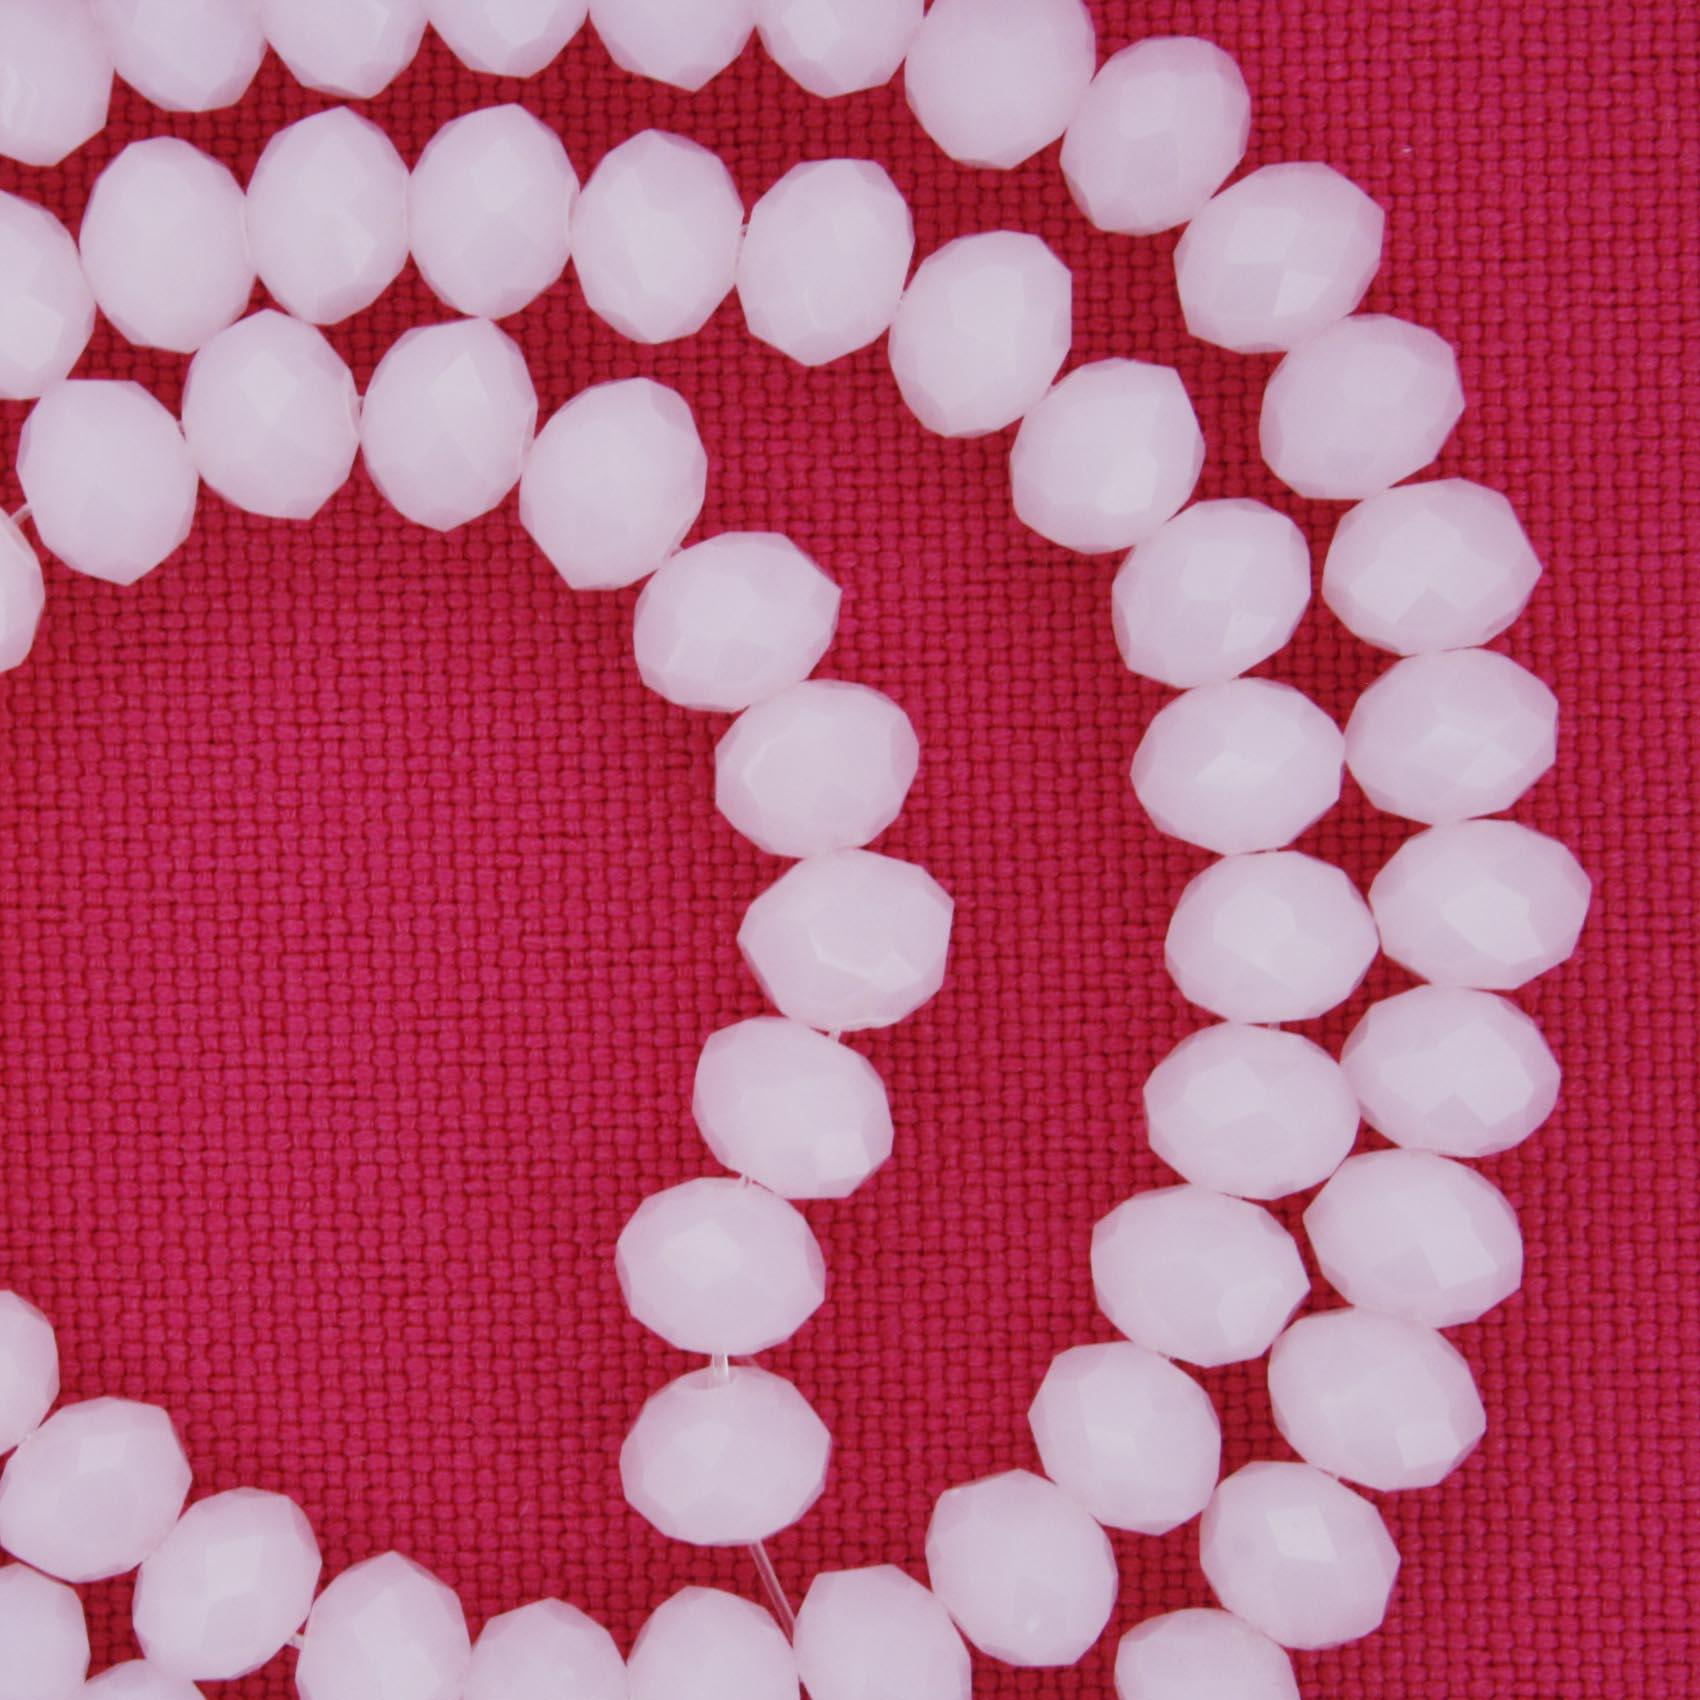 Fio de Cristal - Flat® - Rosa - 6mm  - Stéphanie Bijoux® - Peças para Bijuterias e Artesanato